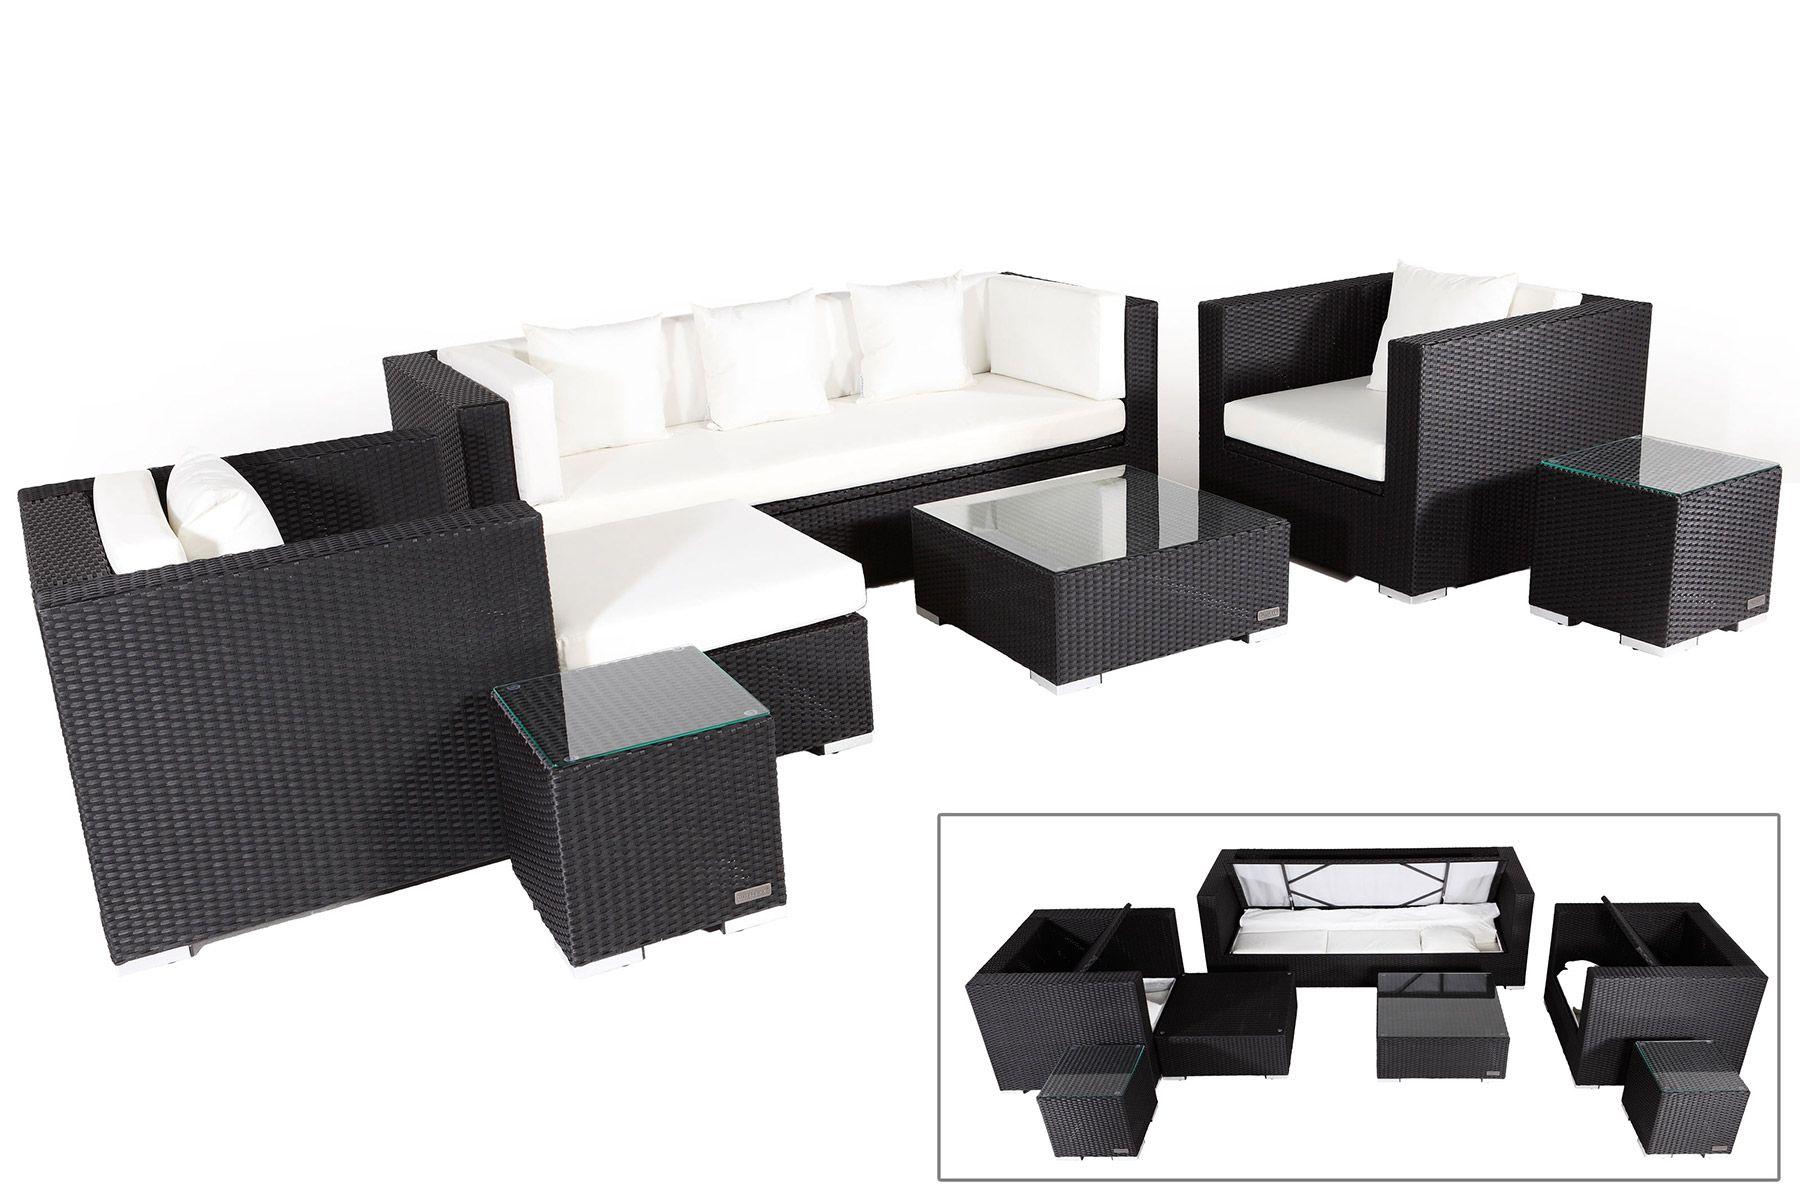 OUTFLEXX Rattanmöbel Sitzgruppe aus Polyrattan mit Kissenboxfunktion ...